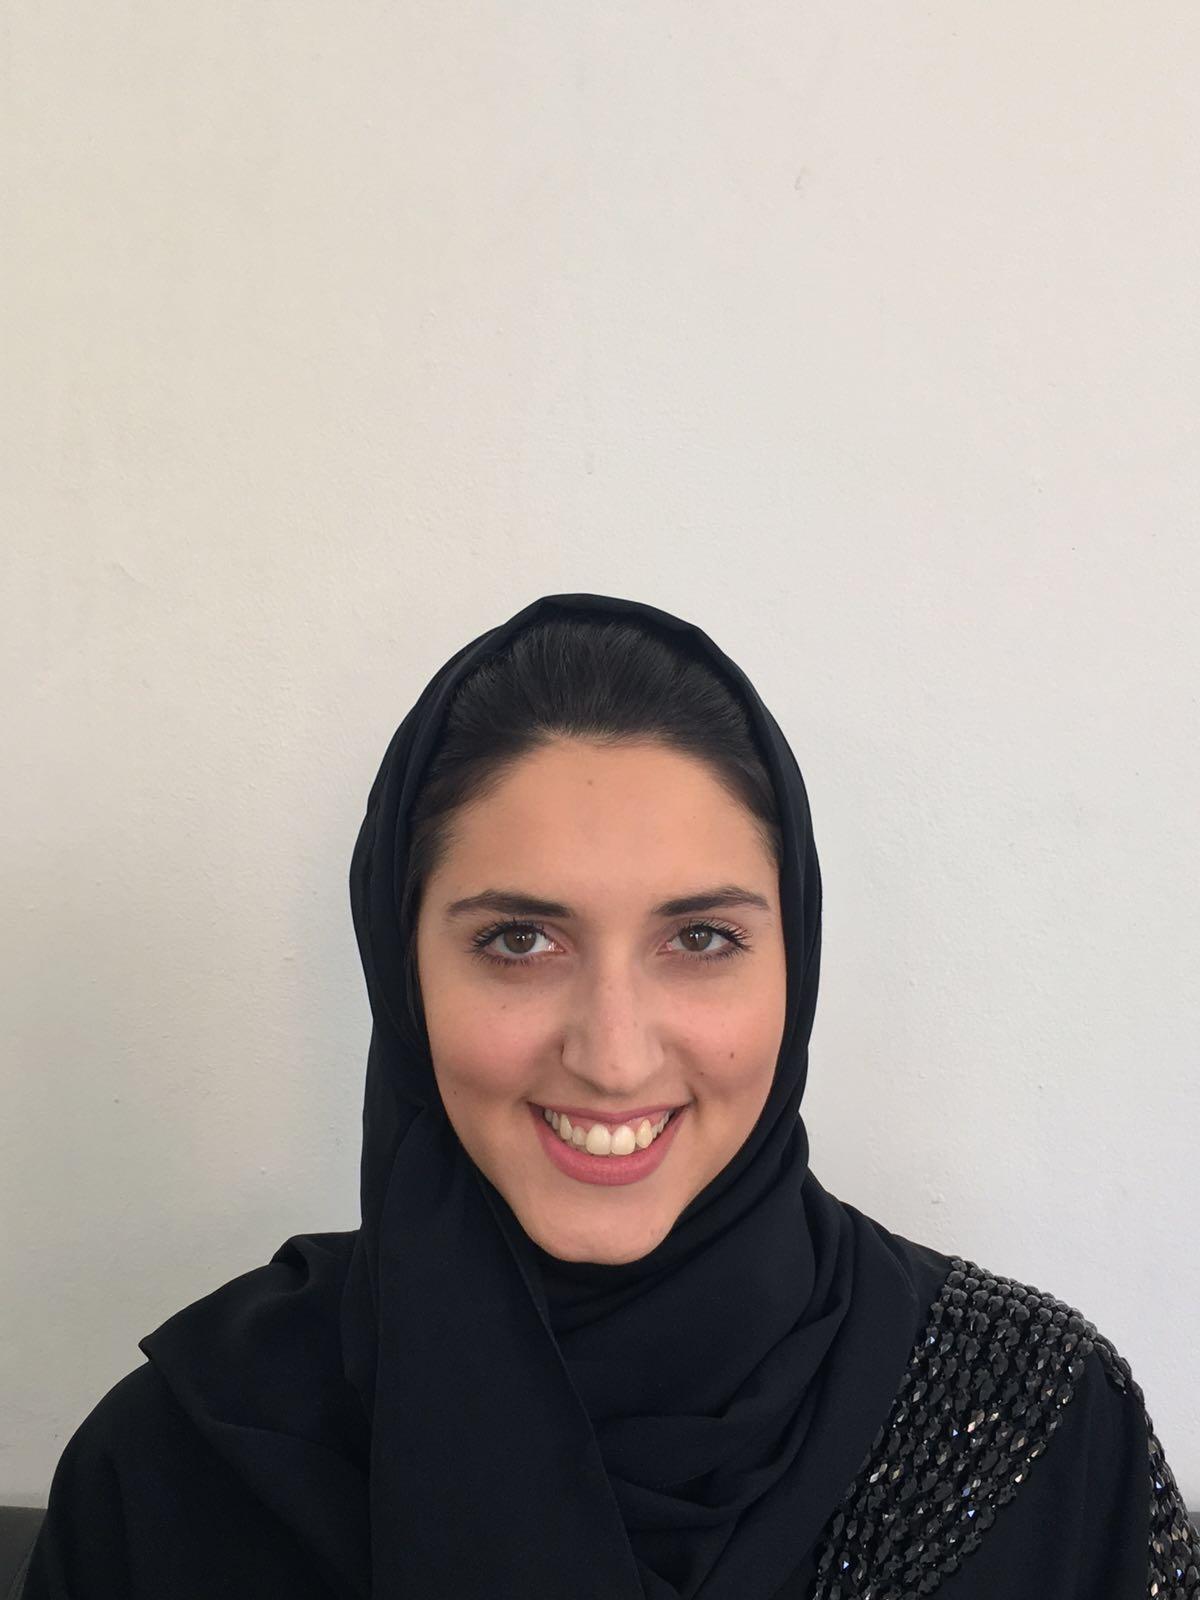 Mariam Obaid Al Muhairi